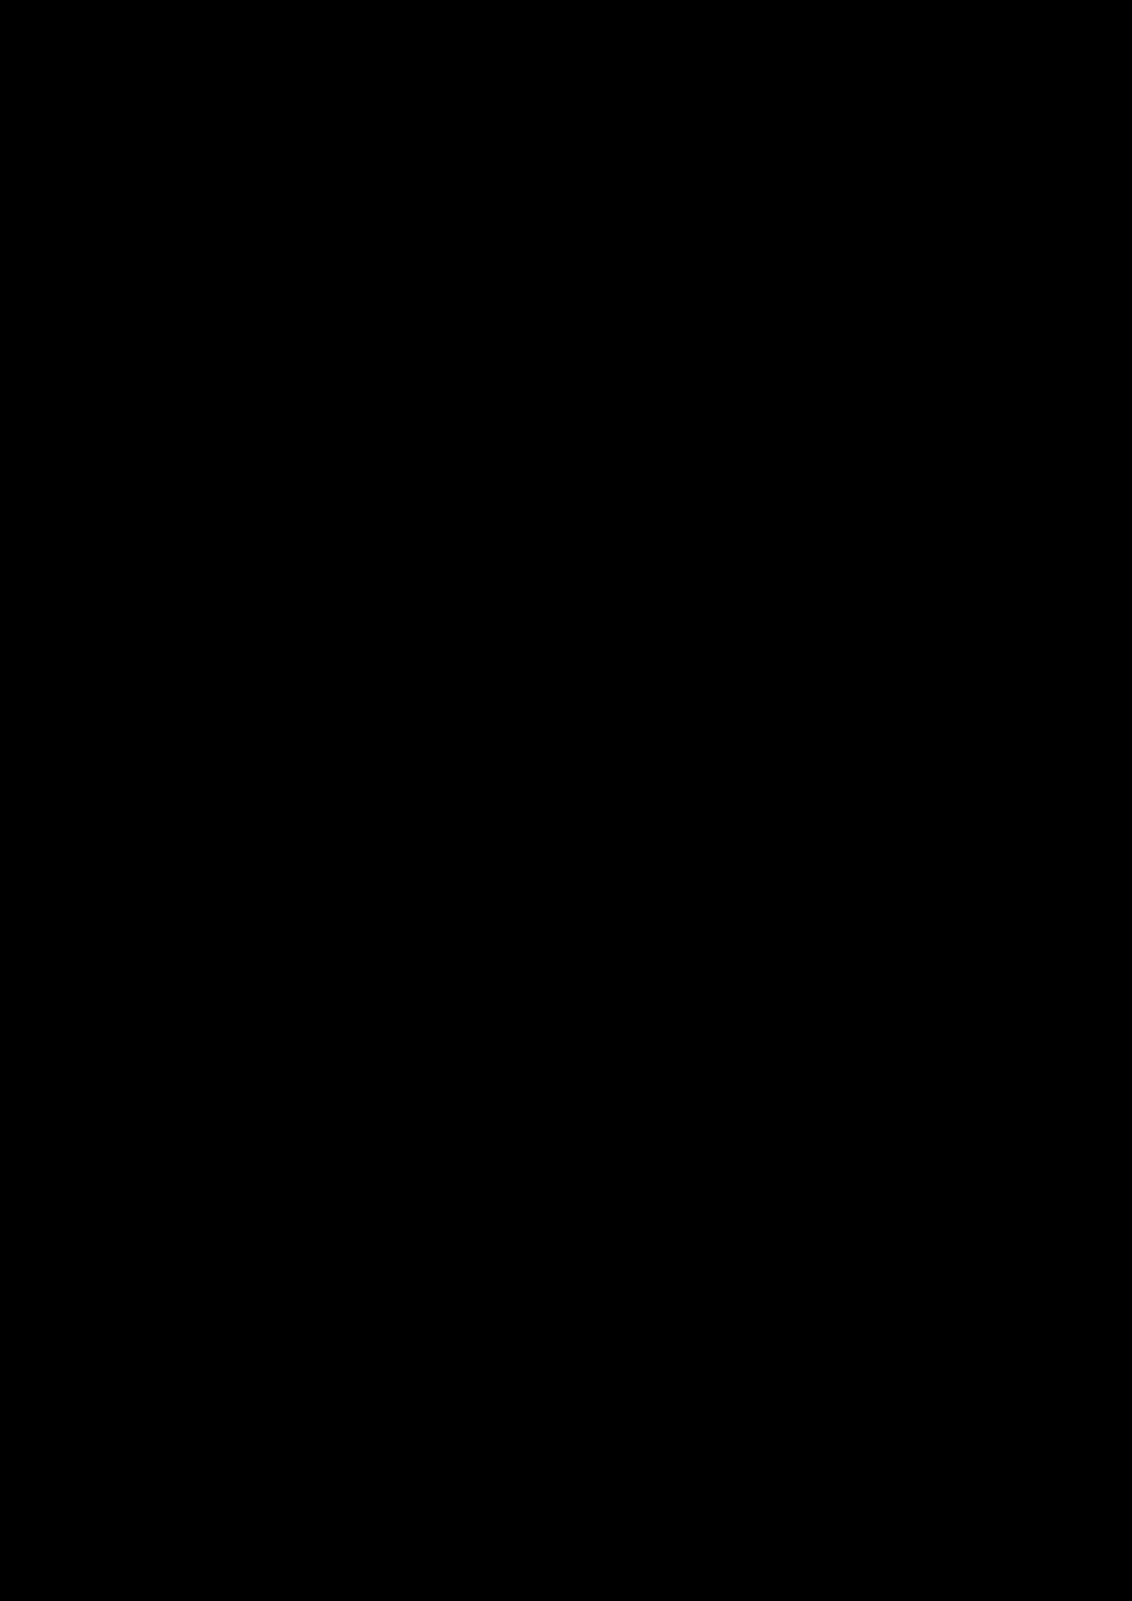 Korolevstvo slez slide, Image 69